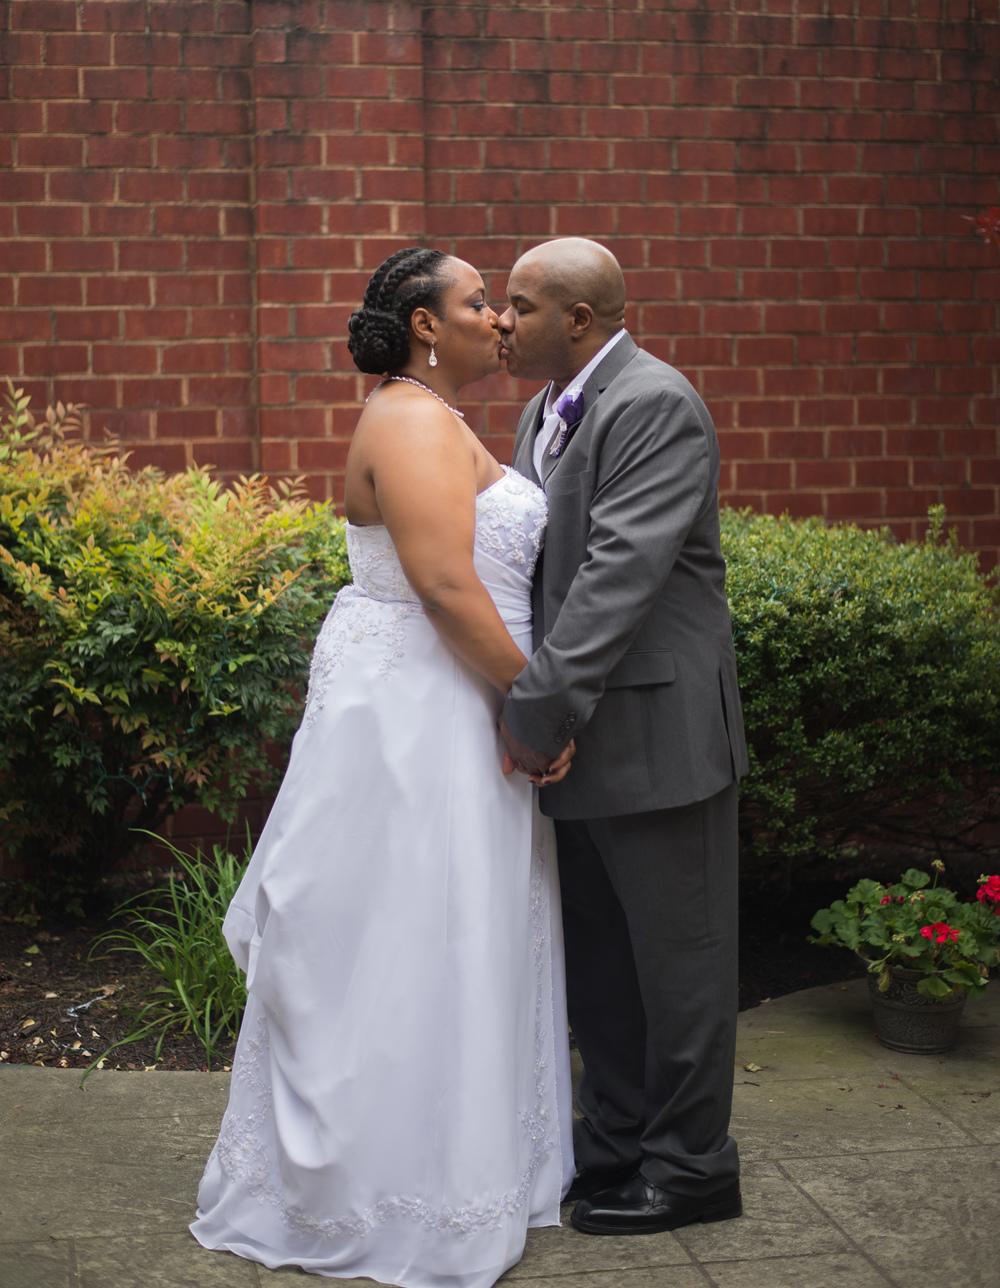 Mr. & Mrs. Pines-26.jpg